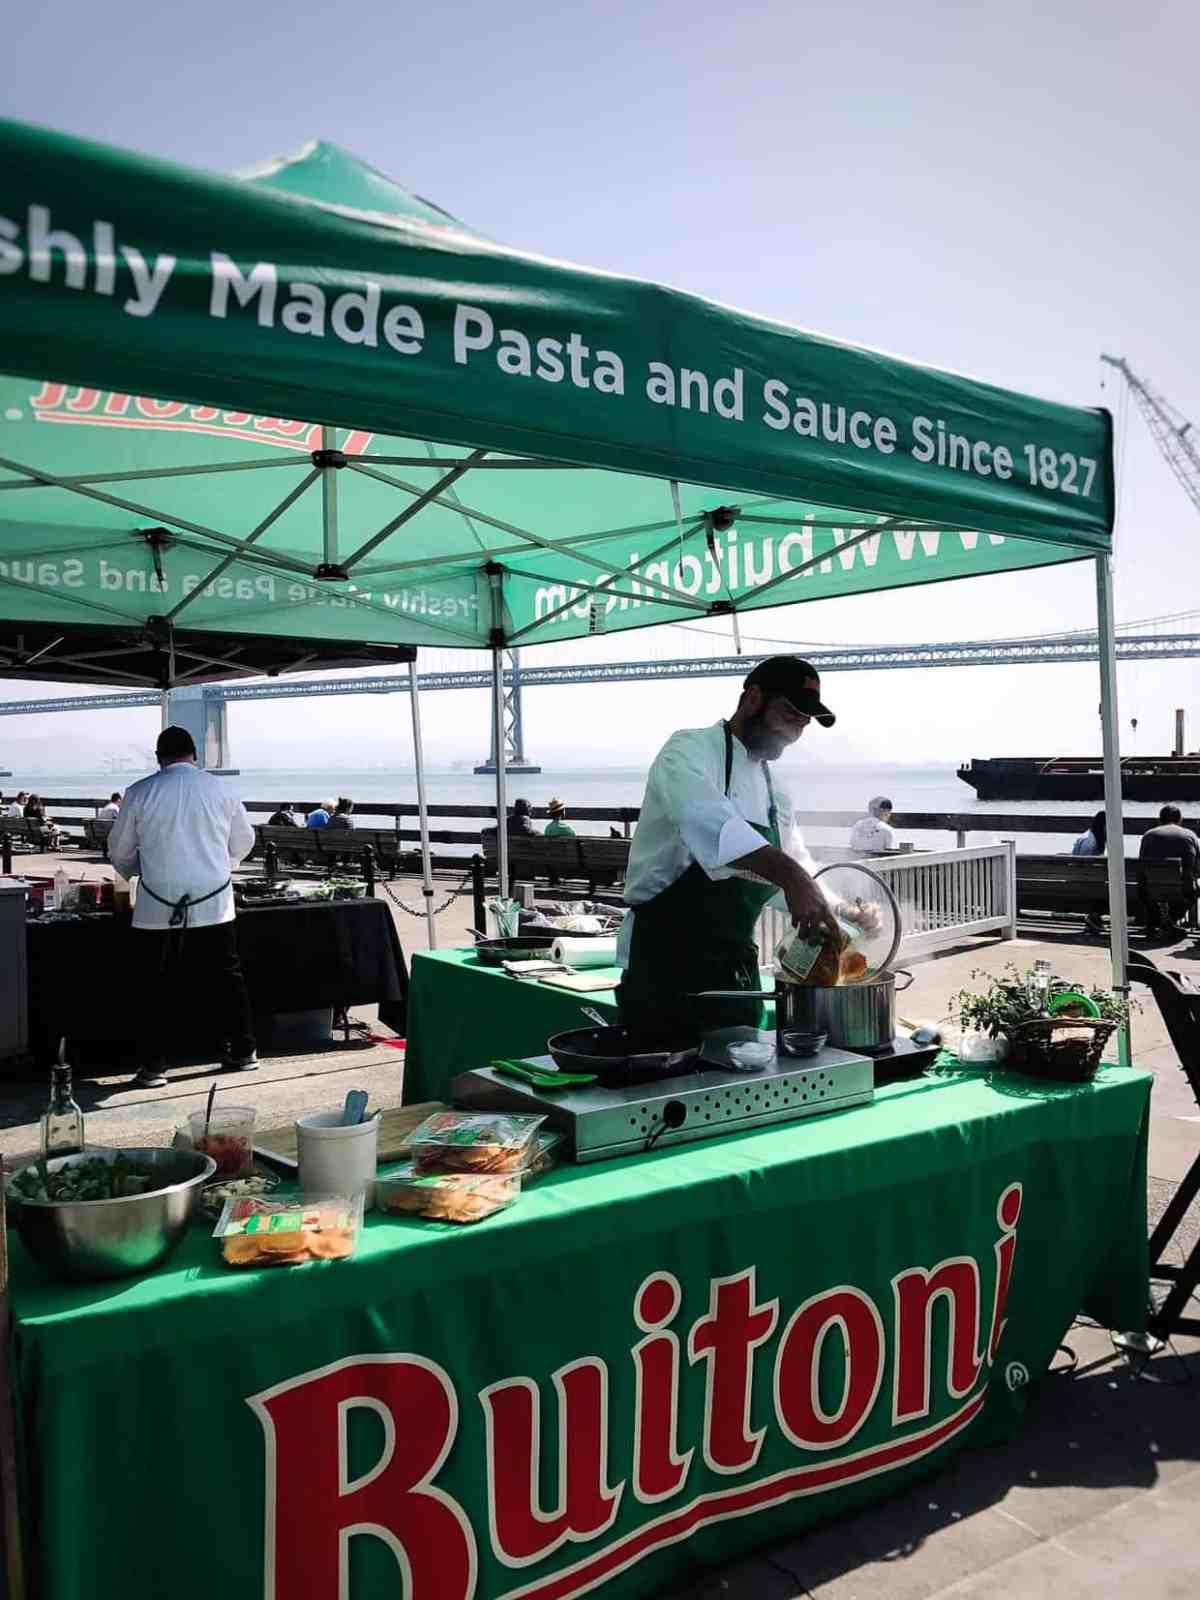 Buitoni recipe demo at Ferry Building Farmer's Market in San Francisco.